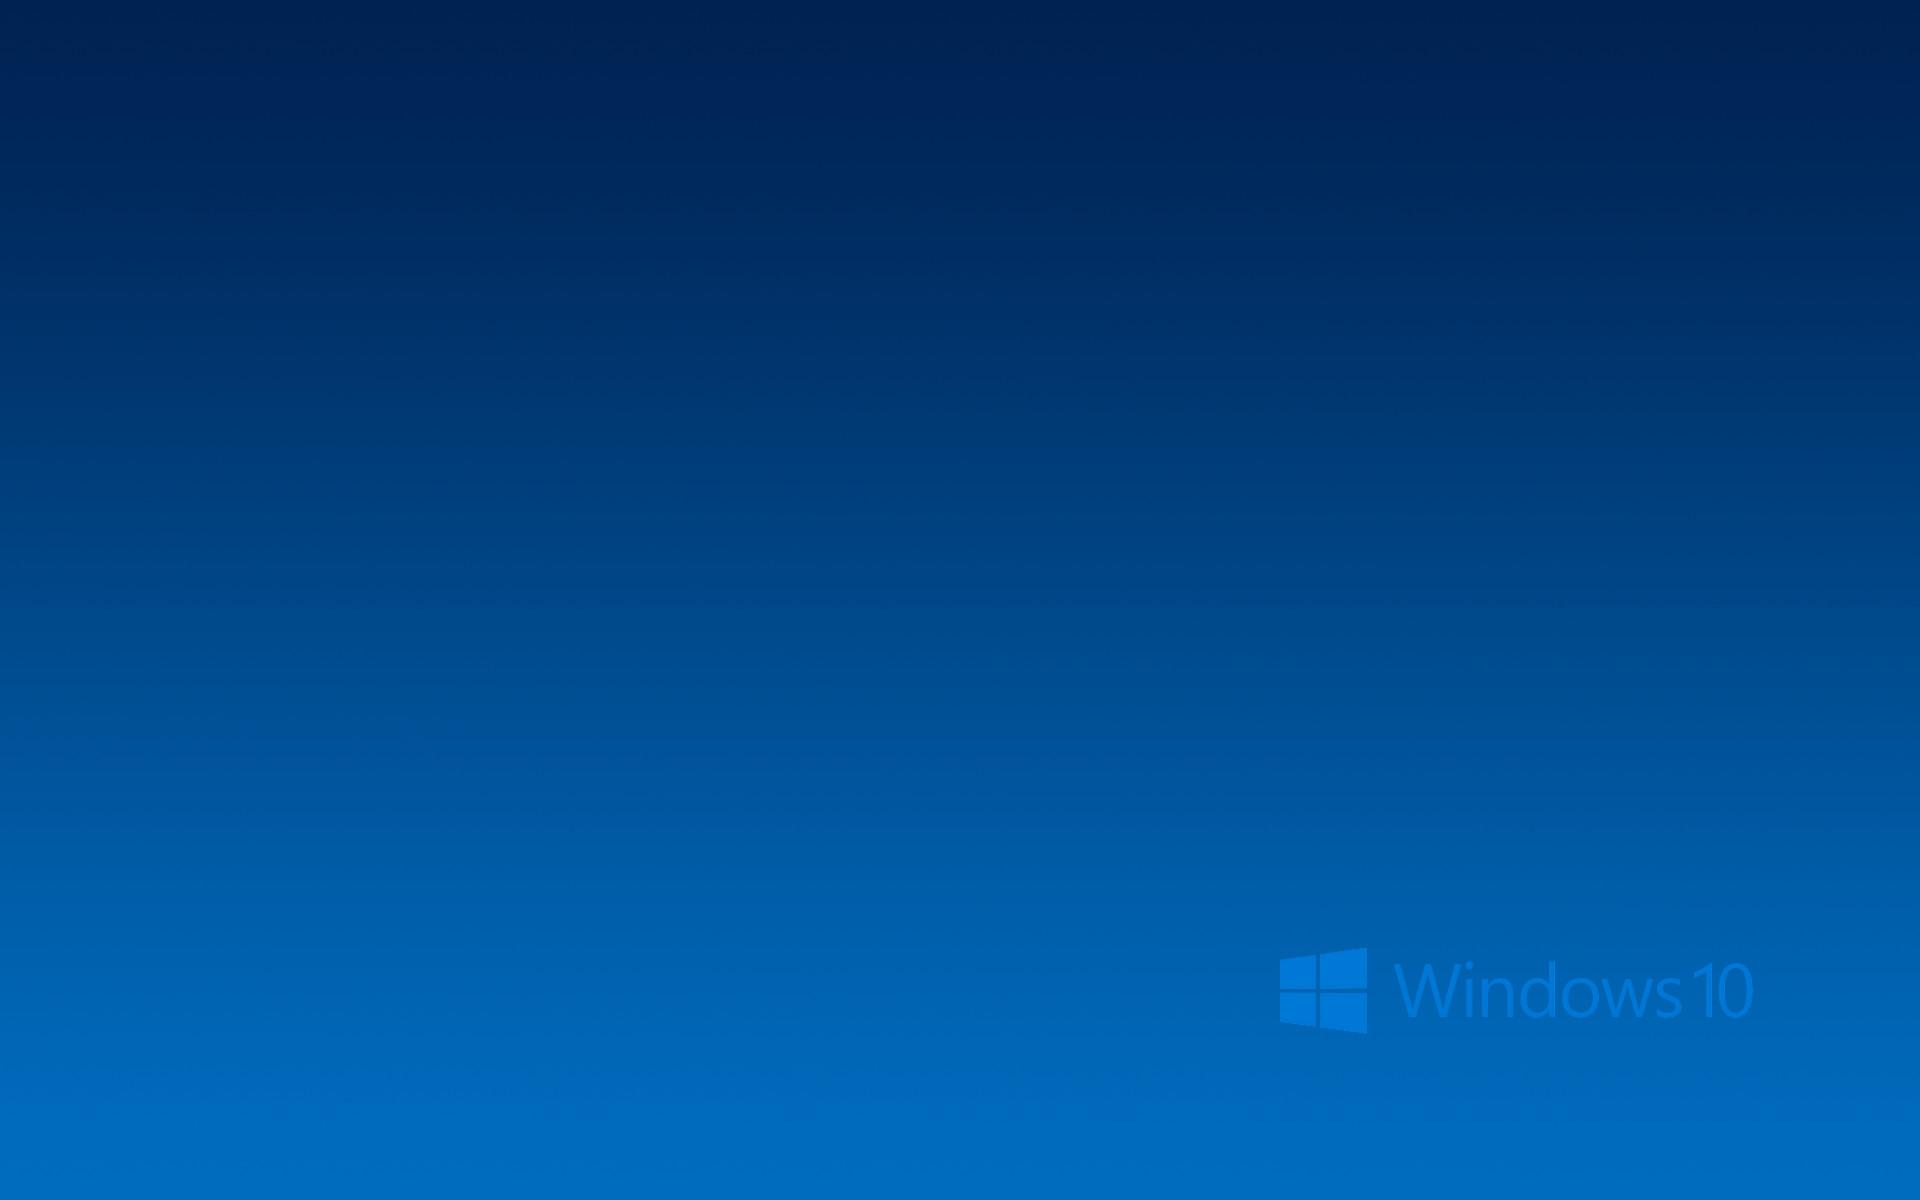 Default Iphone 7 Wallpaper Sfondi Pc Windows 10 82 Immagini